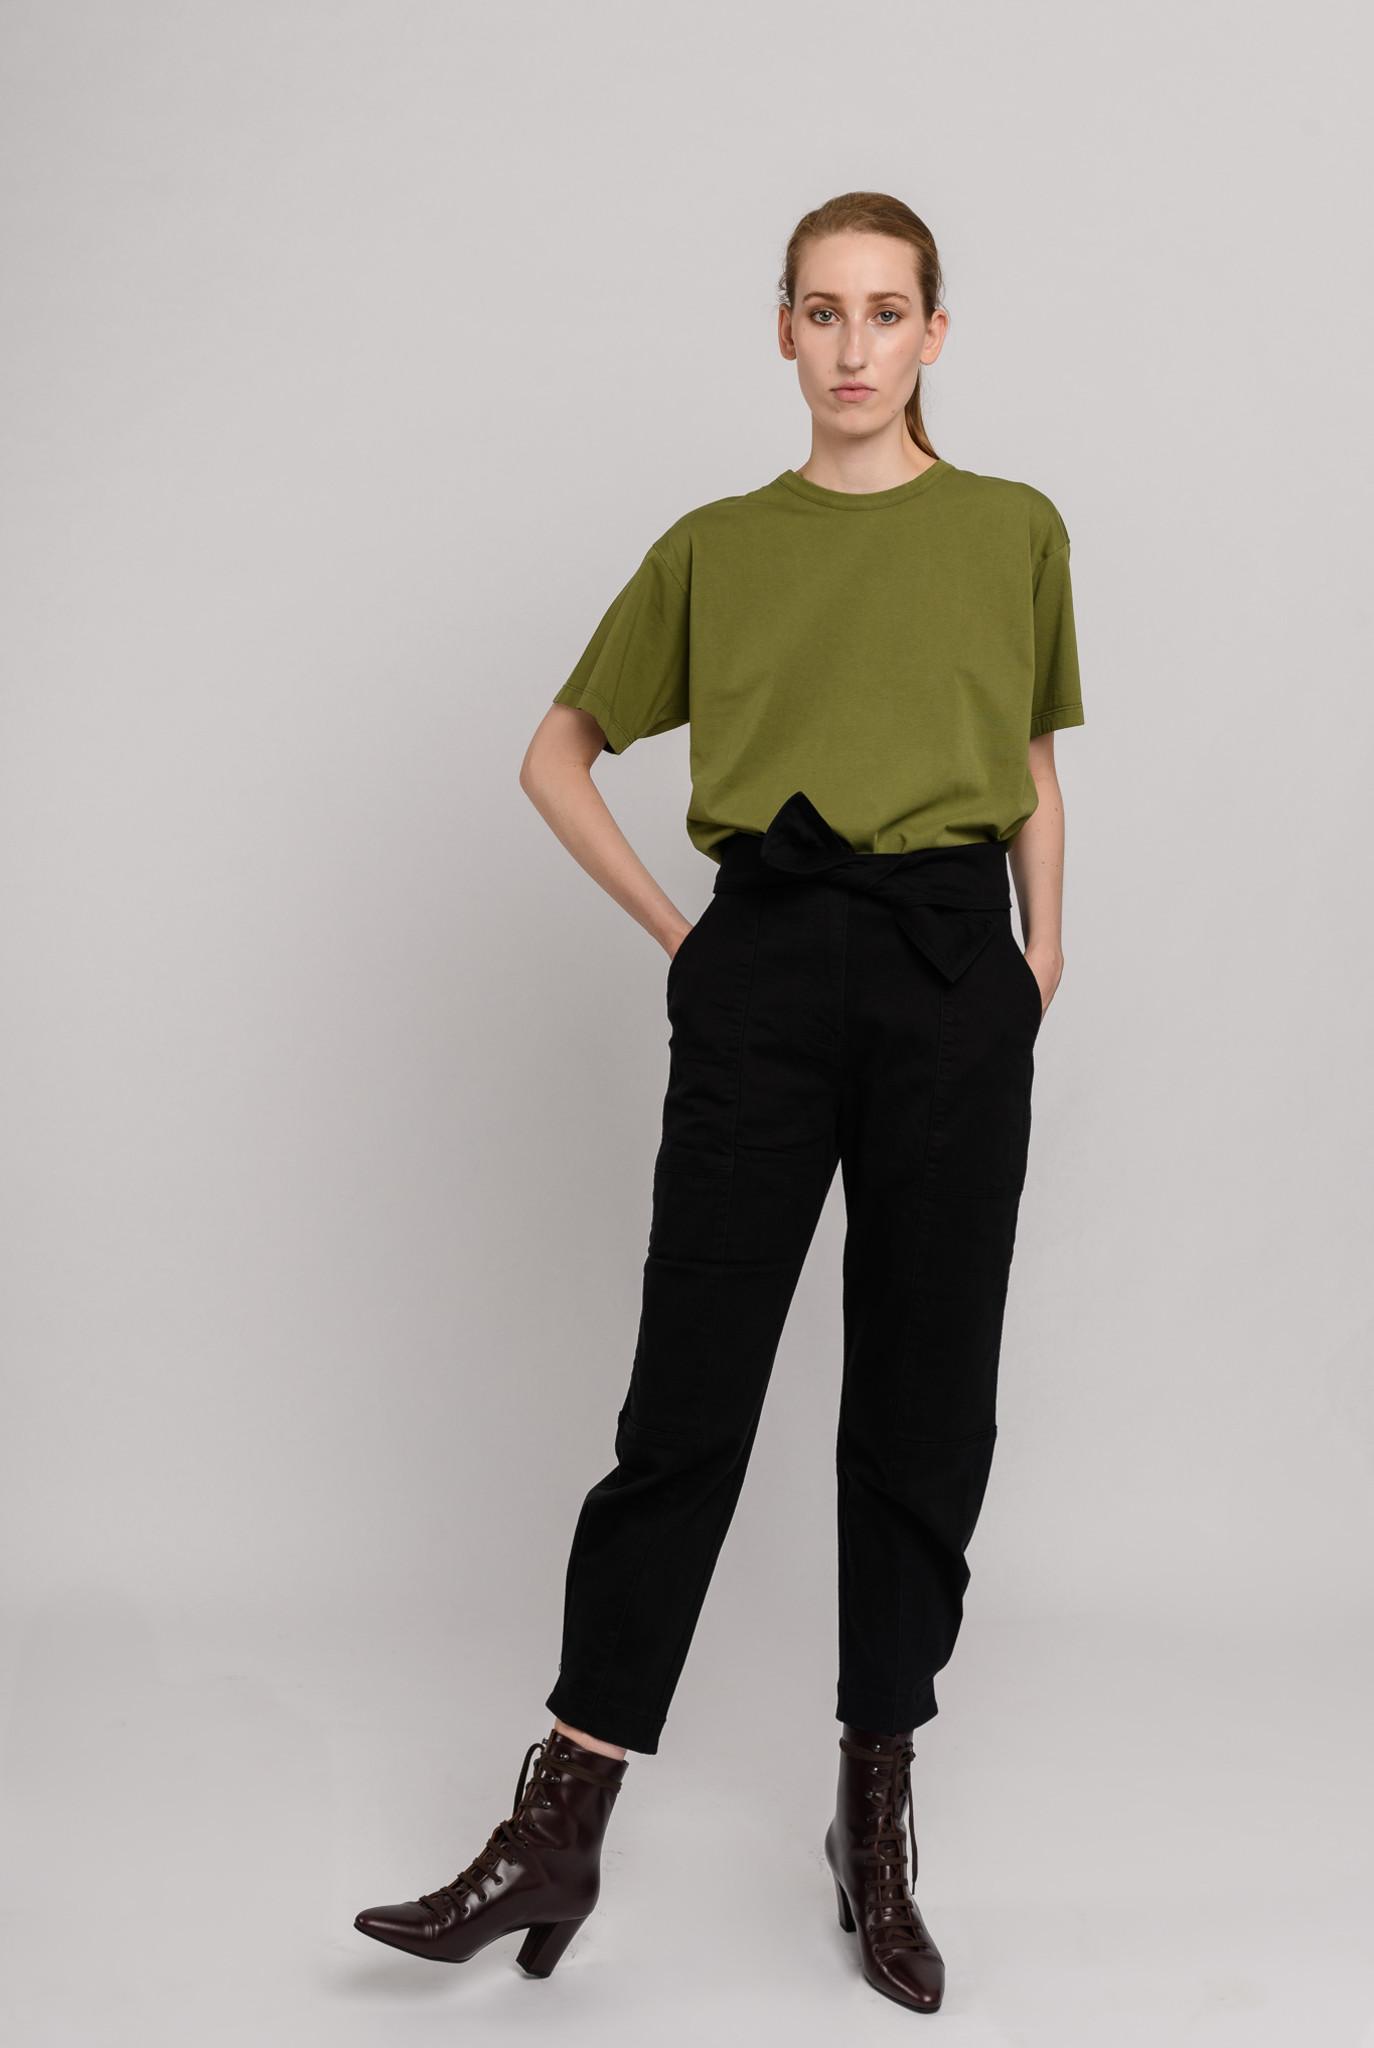 Unisex t-shirt S/S Avocado